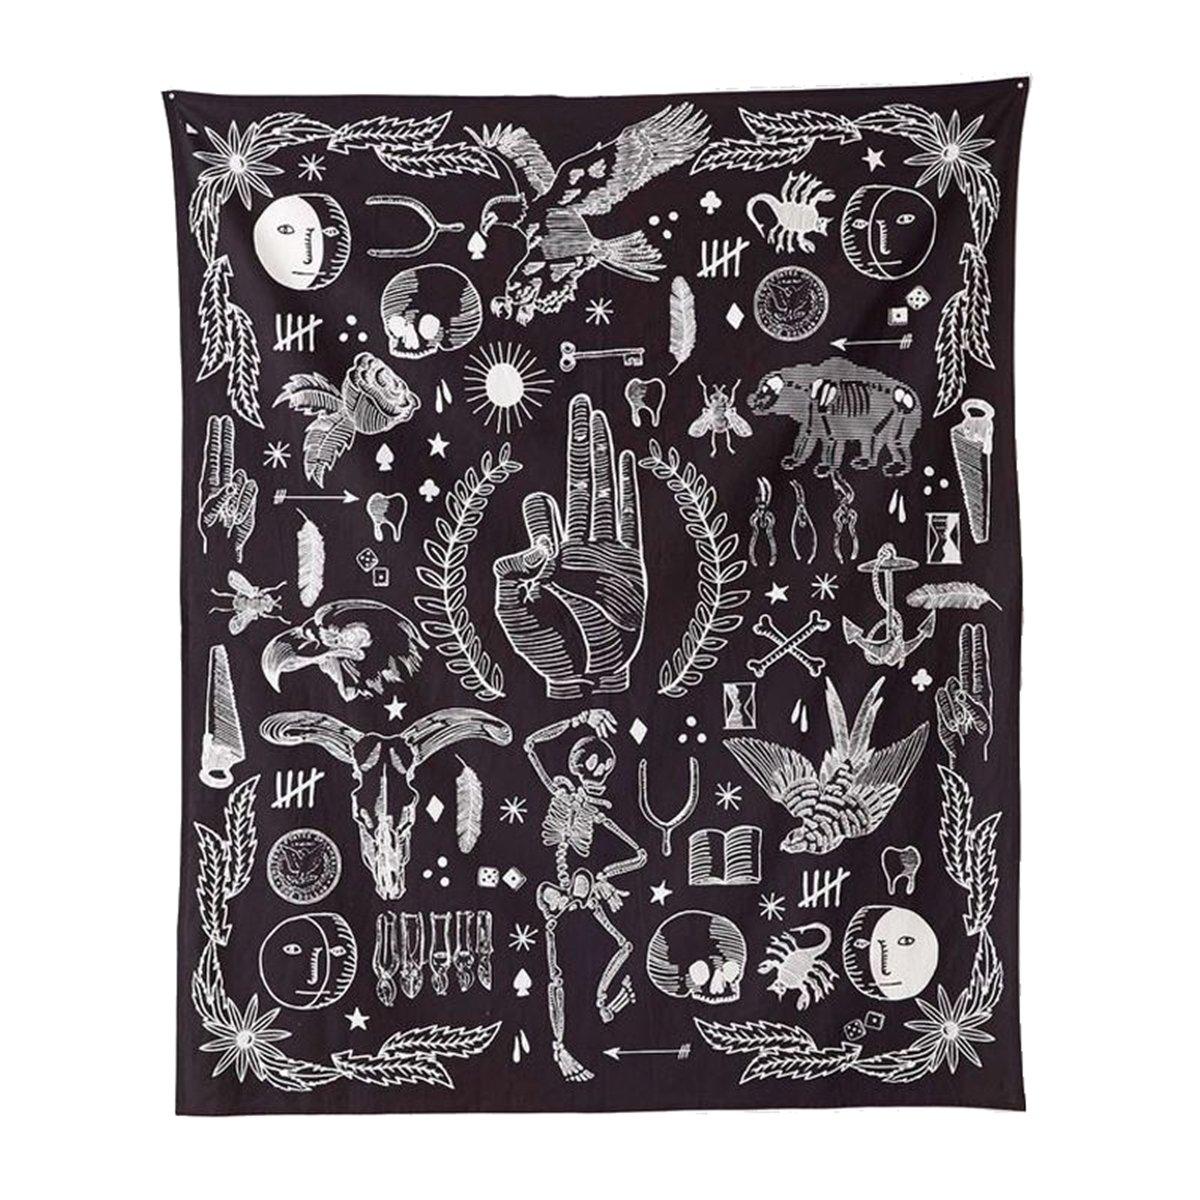 Jeteven Hippie-Tapisserie Mandala Wandteppich Blau forest Tuch, indisch Elephant Wandbehang Wald, Wall Tapestry Boho Yoga Strandtuch Picnic Throw, Wand Deko 165X148cm (H)